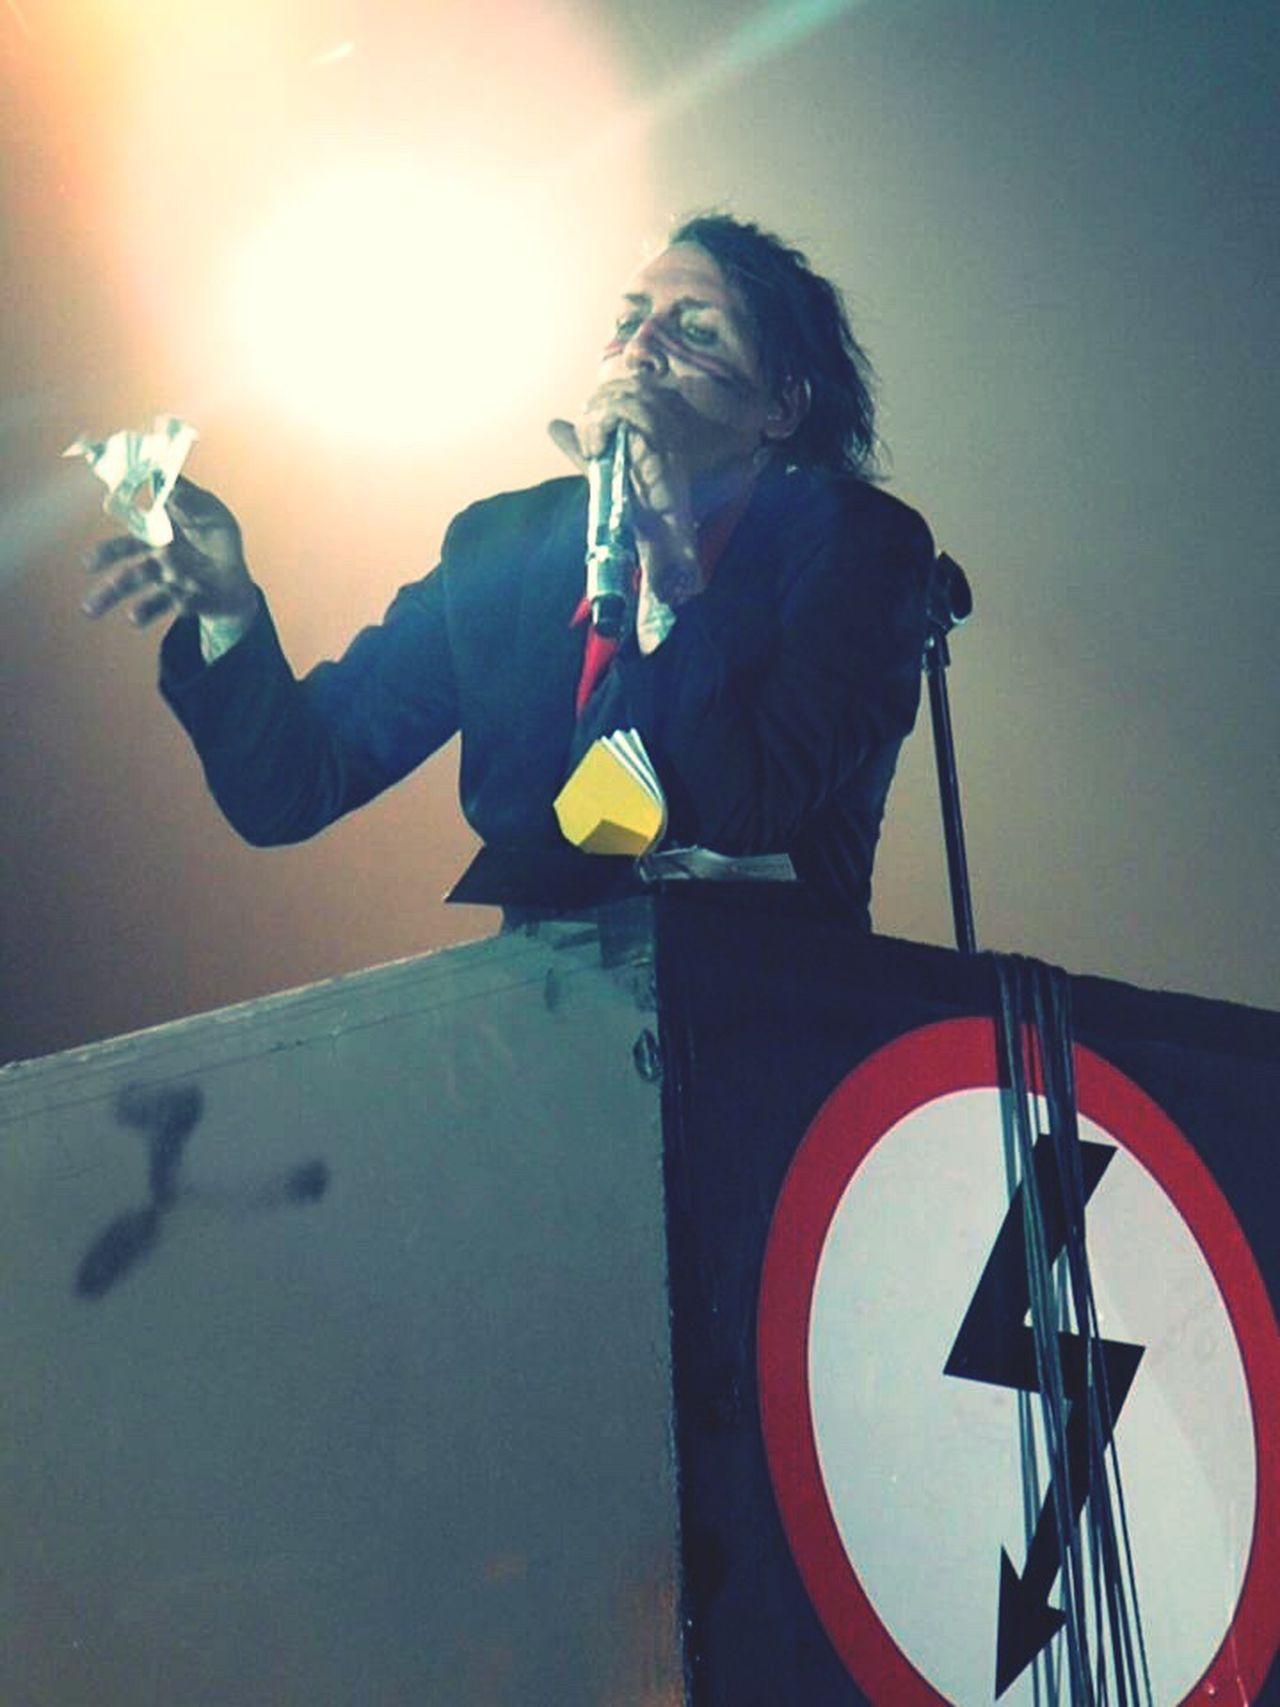 Marilyn Manson antichrist superstar Marilyn Manson Antichrist Superstar Concert Rock N Roll Portrait Live Music